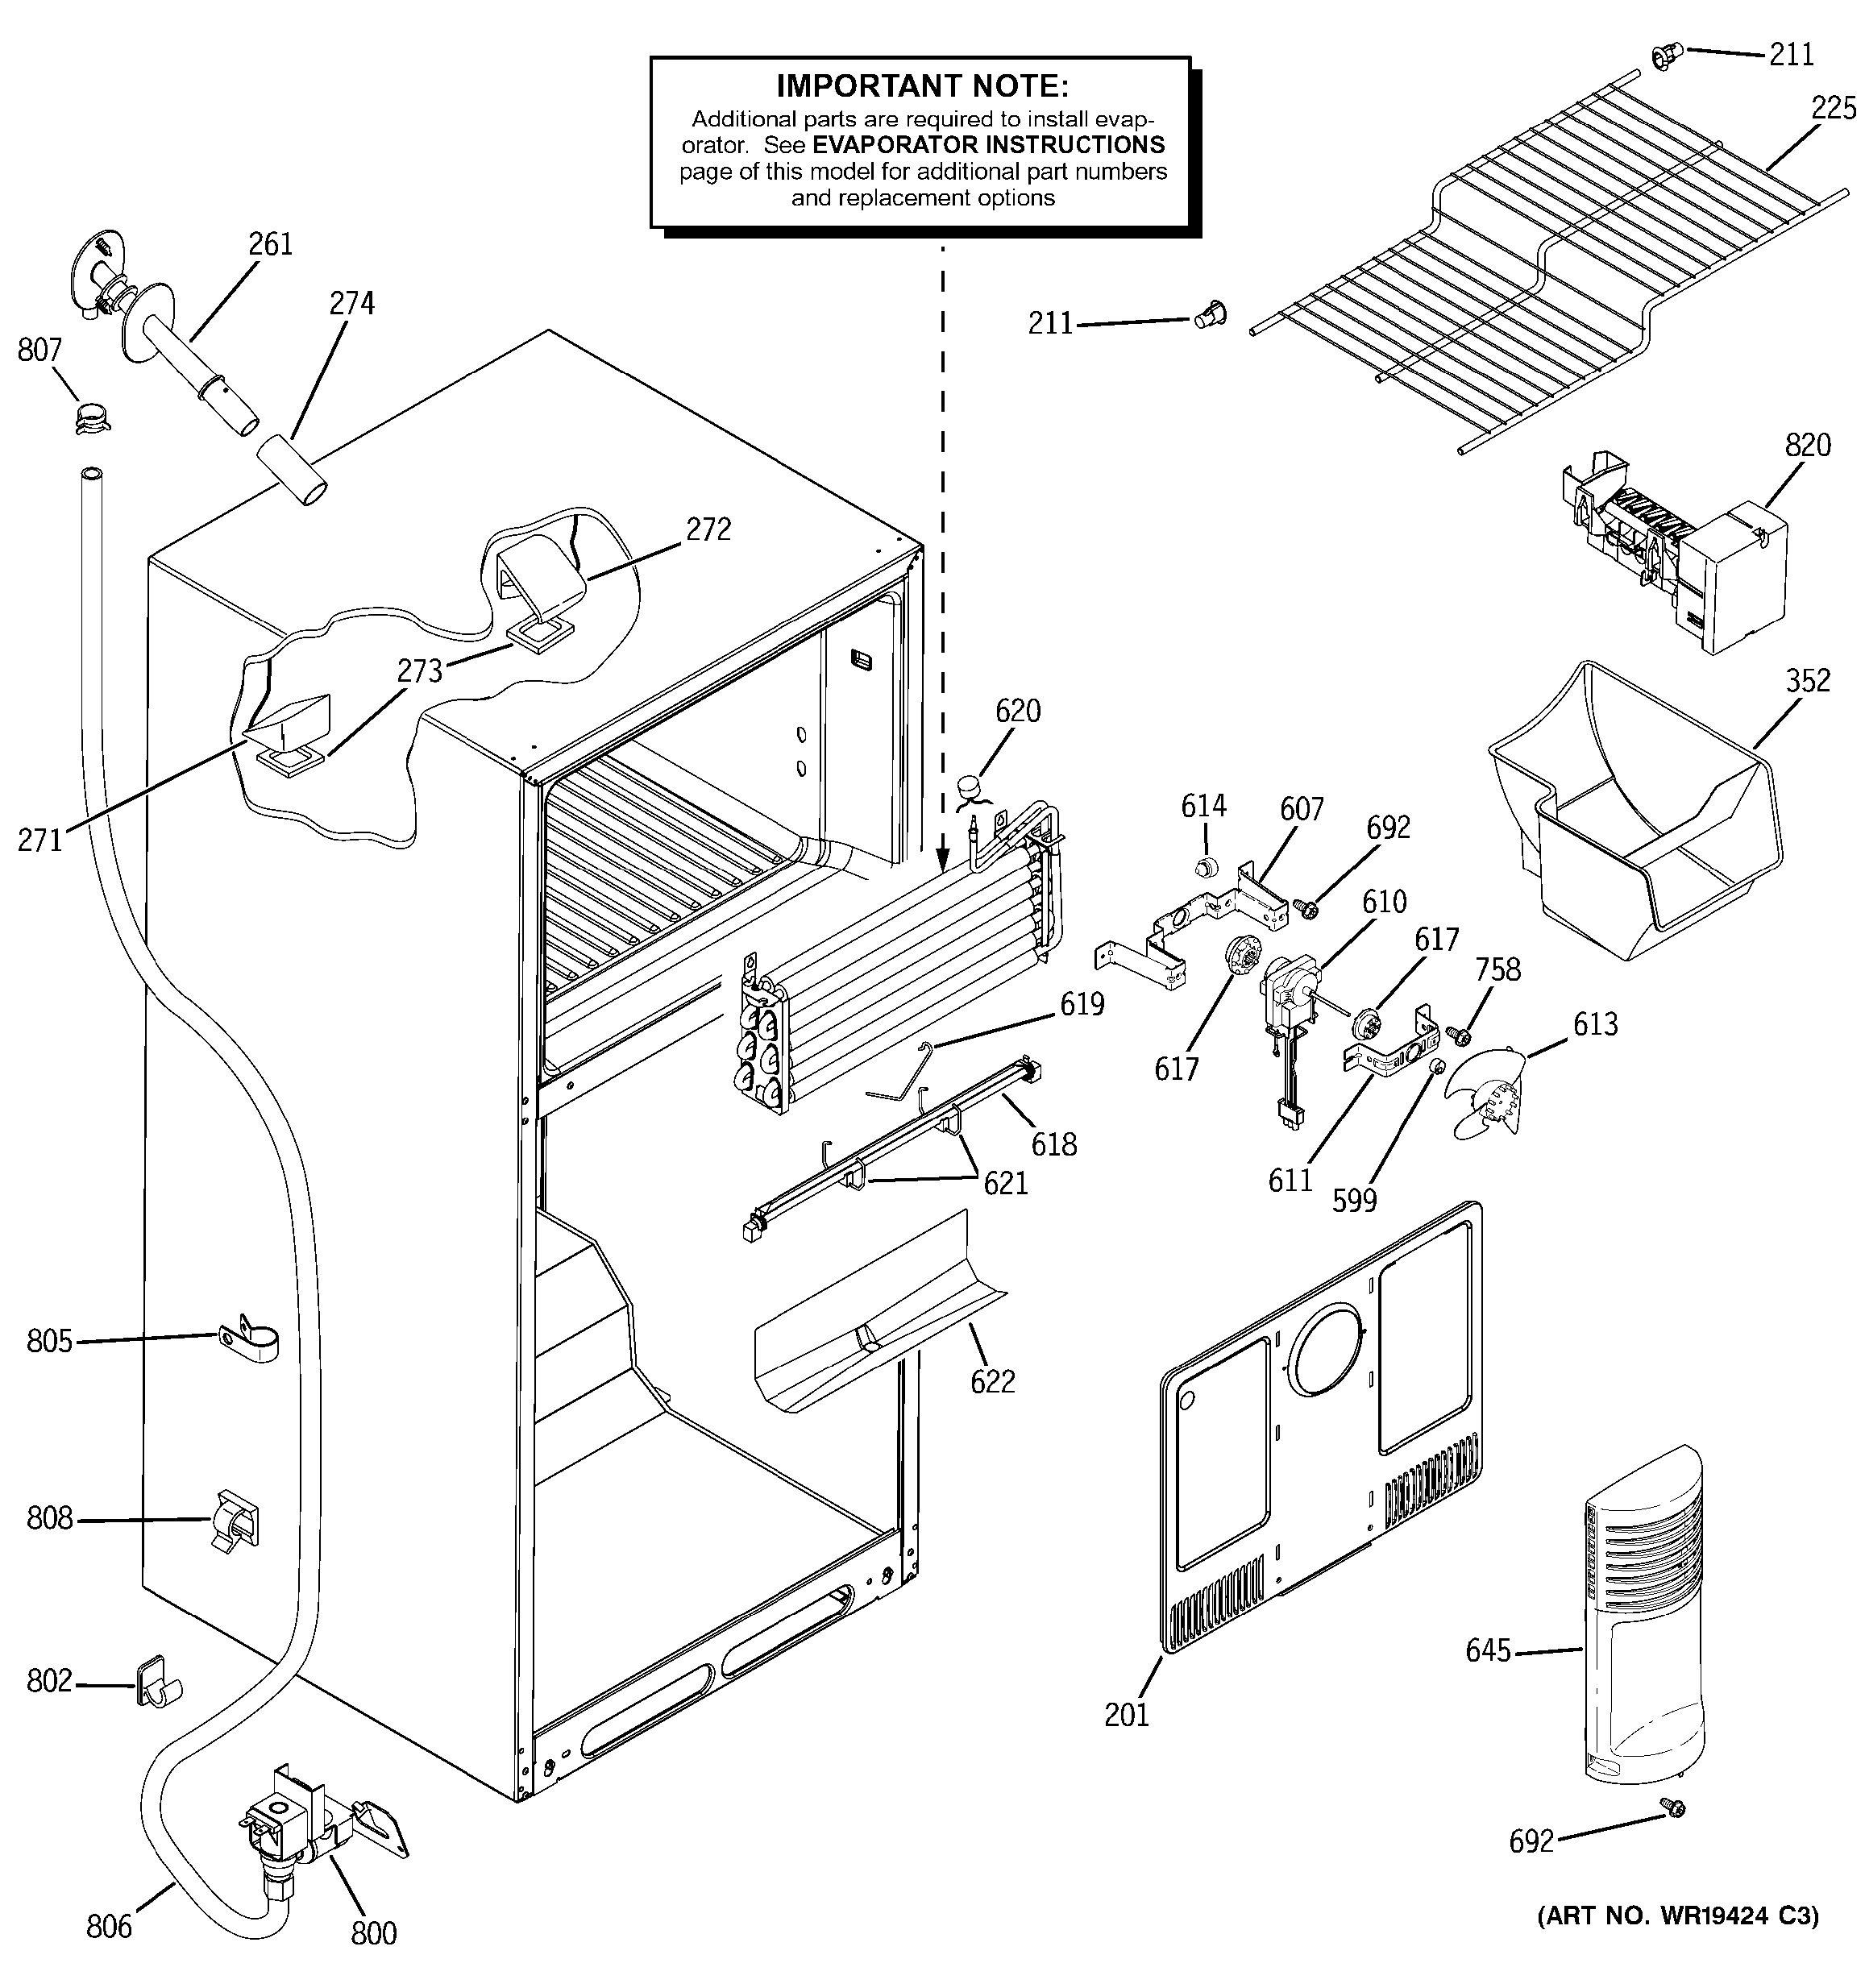 Wiring Diagram For Whirlpool Fridge Freezer